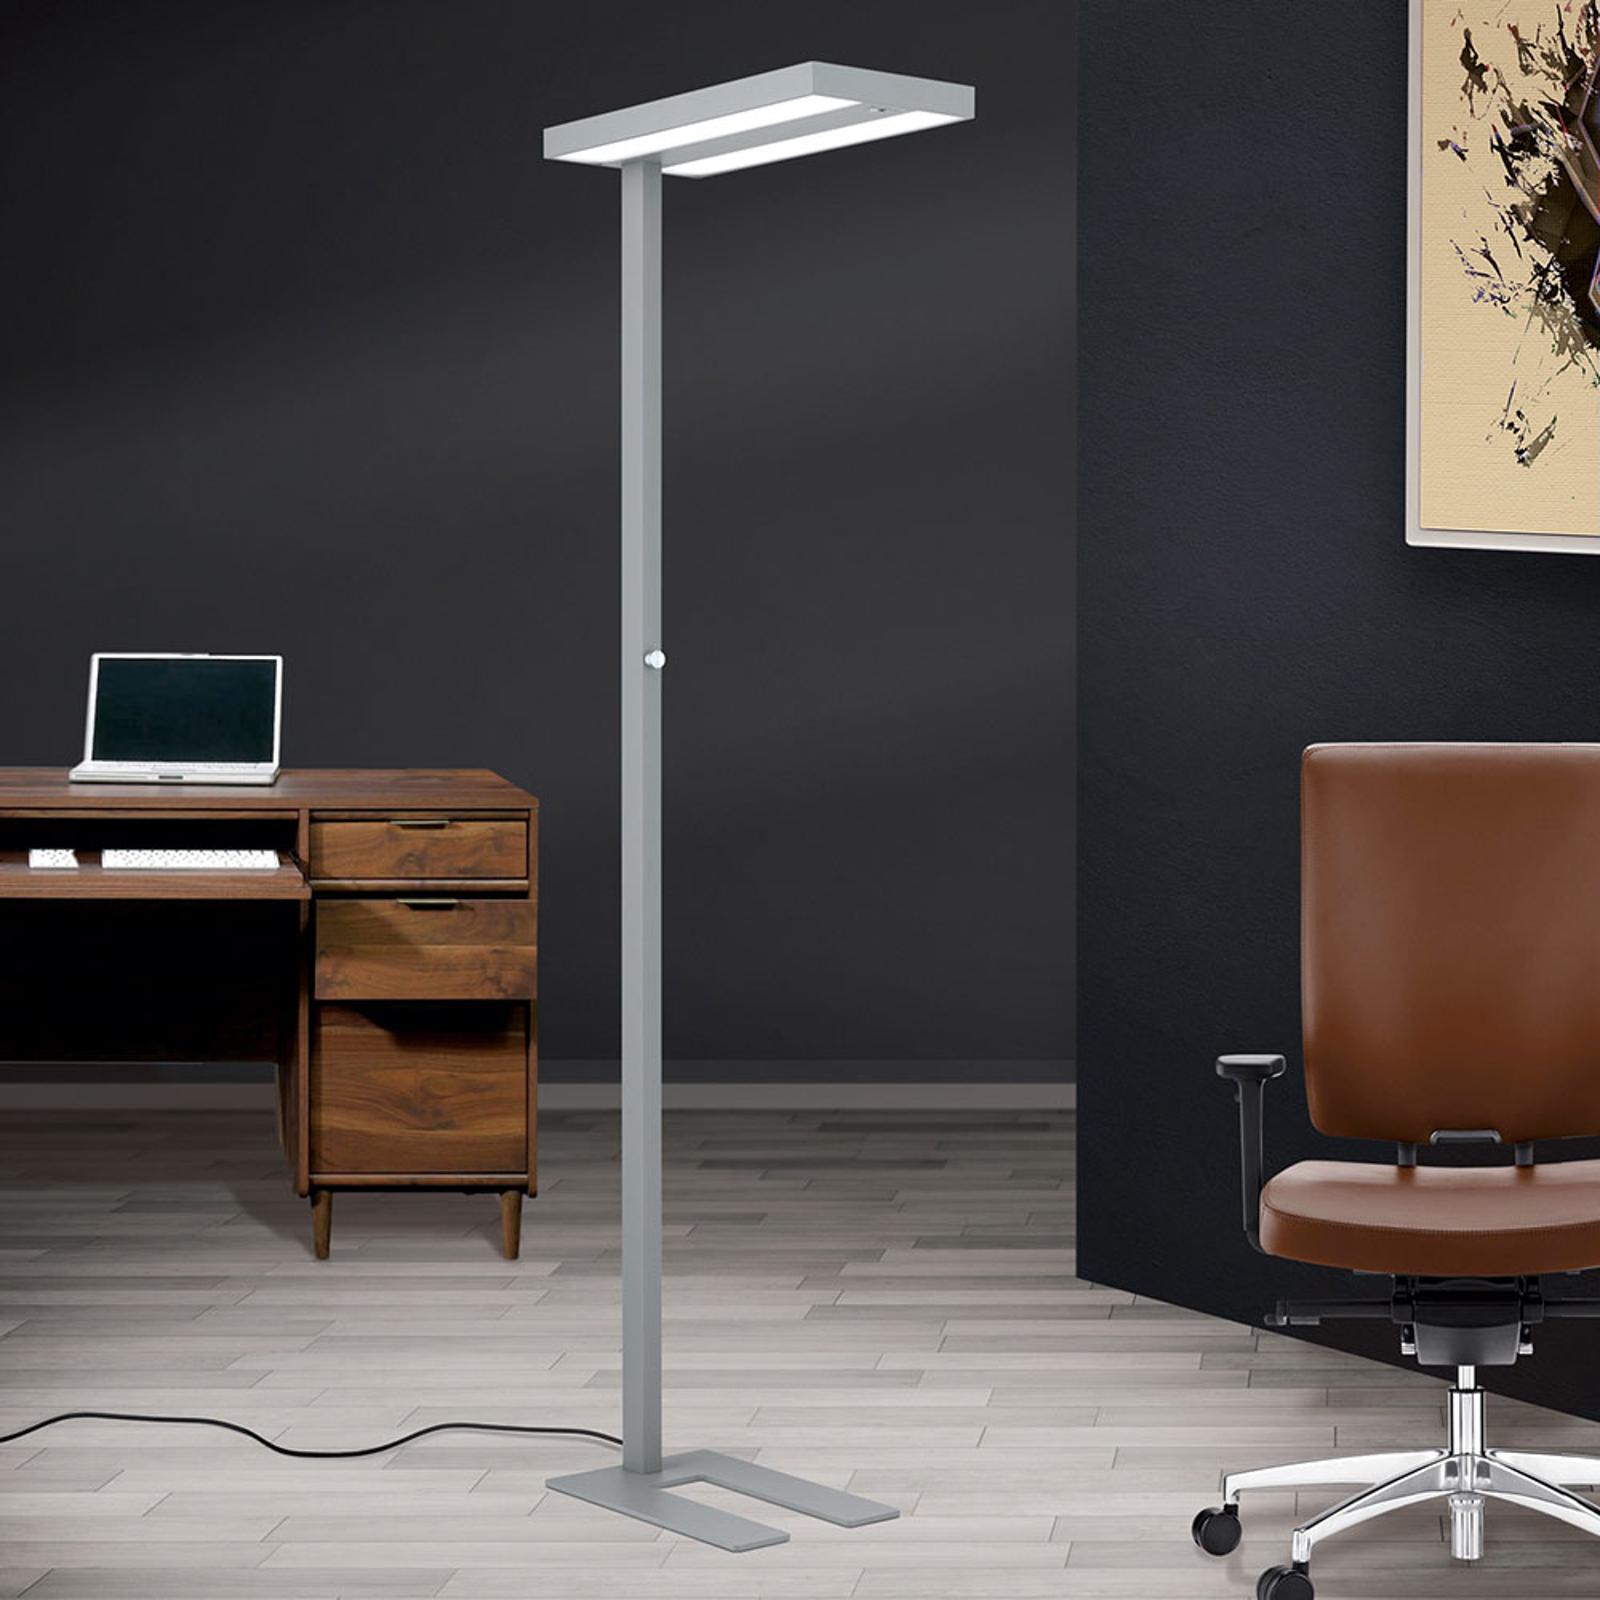 LED-Bürostehleuchte Deno inkl. TL-& Bewegungsensor